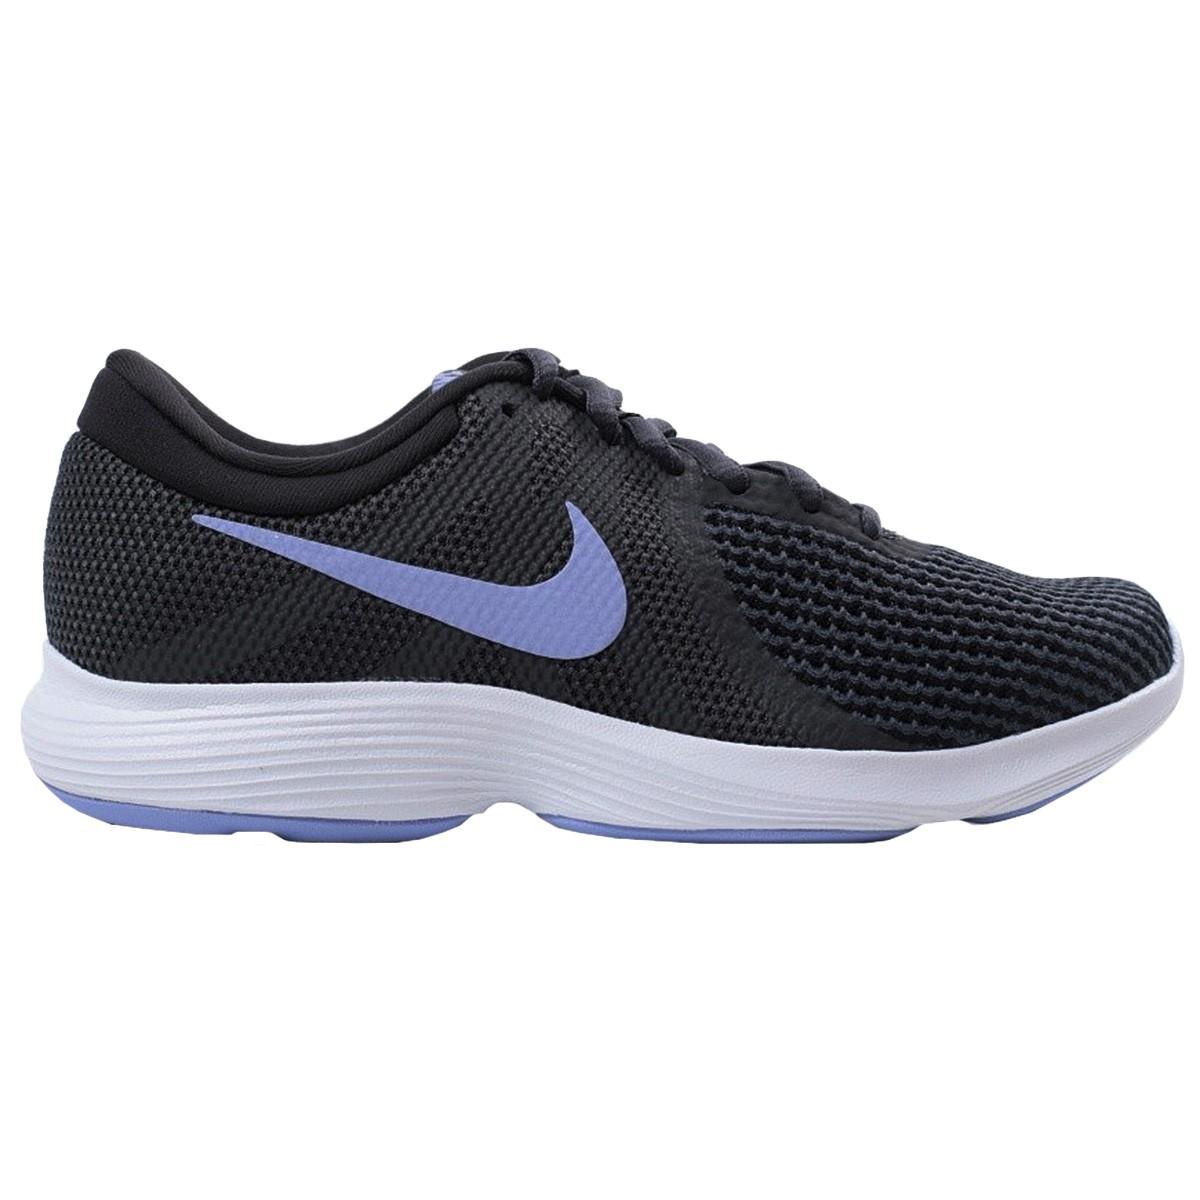 Revolution Running Nike Femme 4 Chaussures q40HfwX